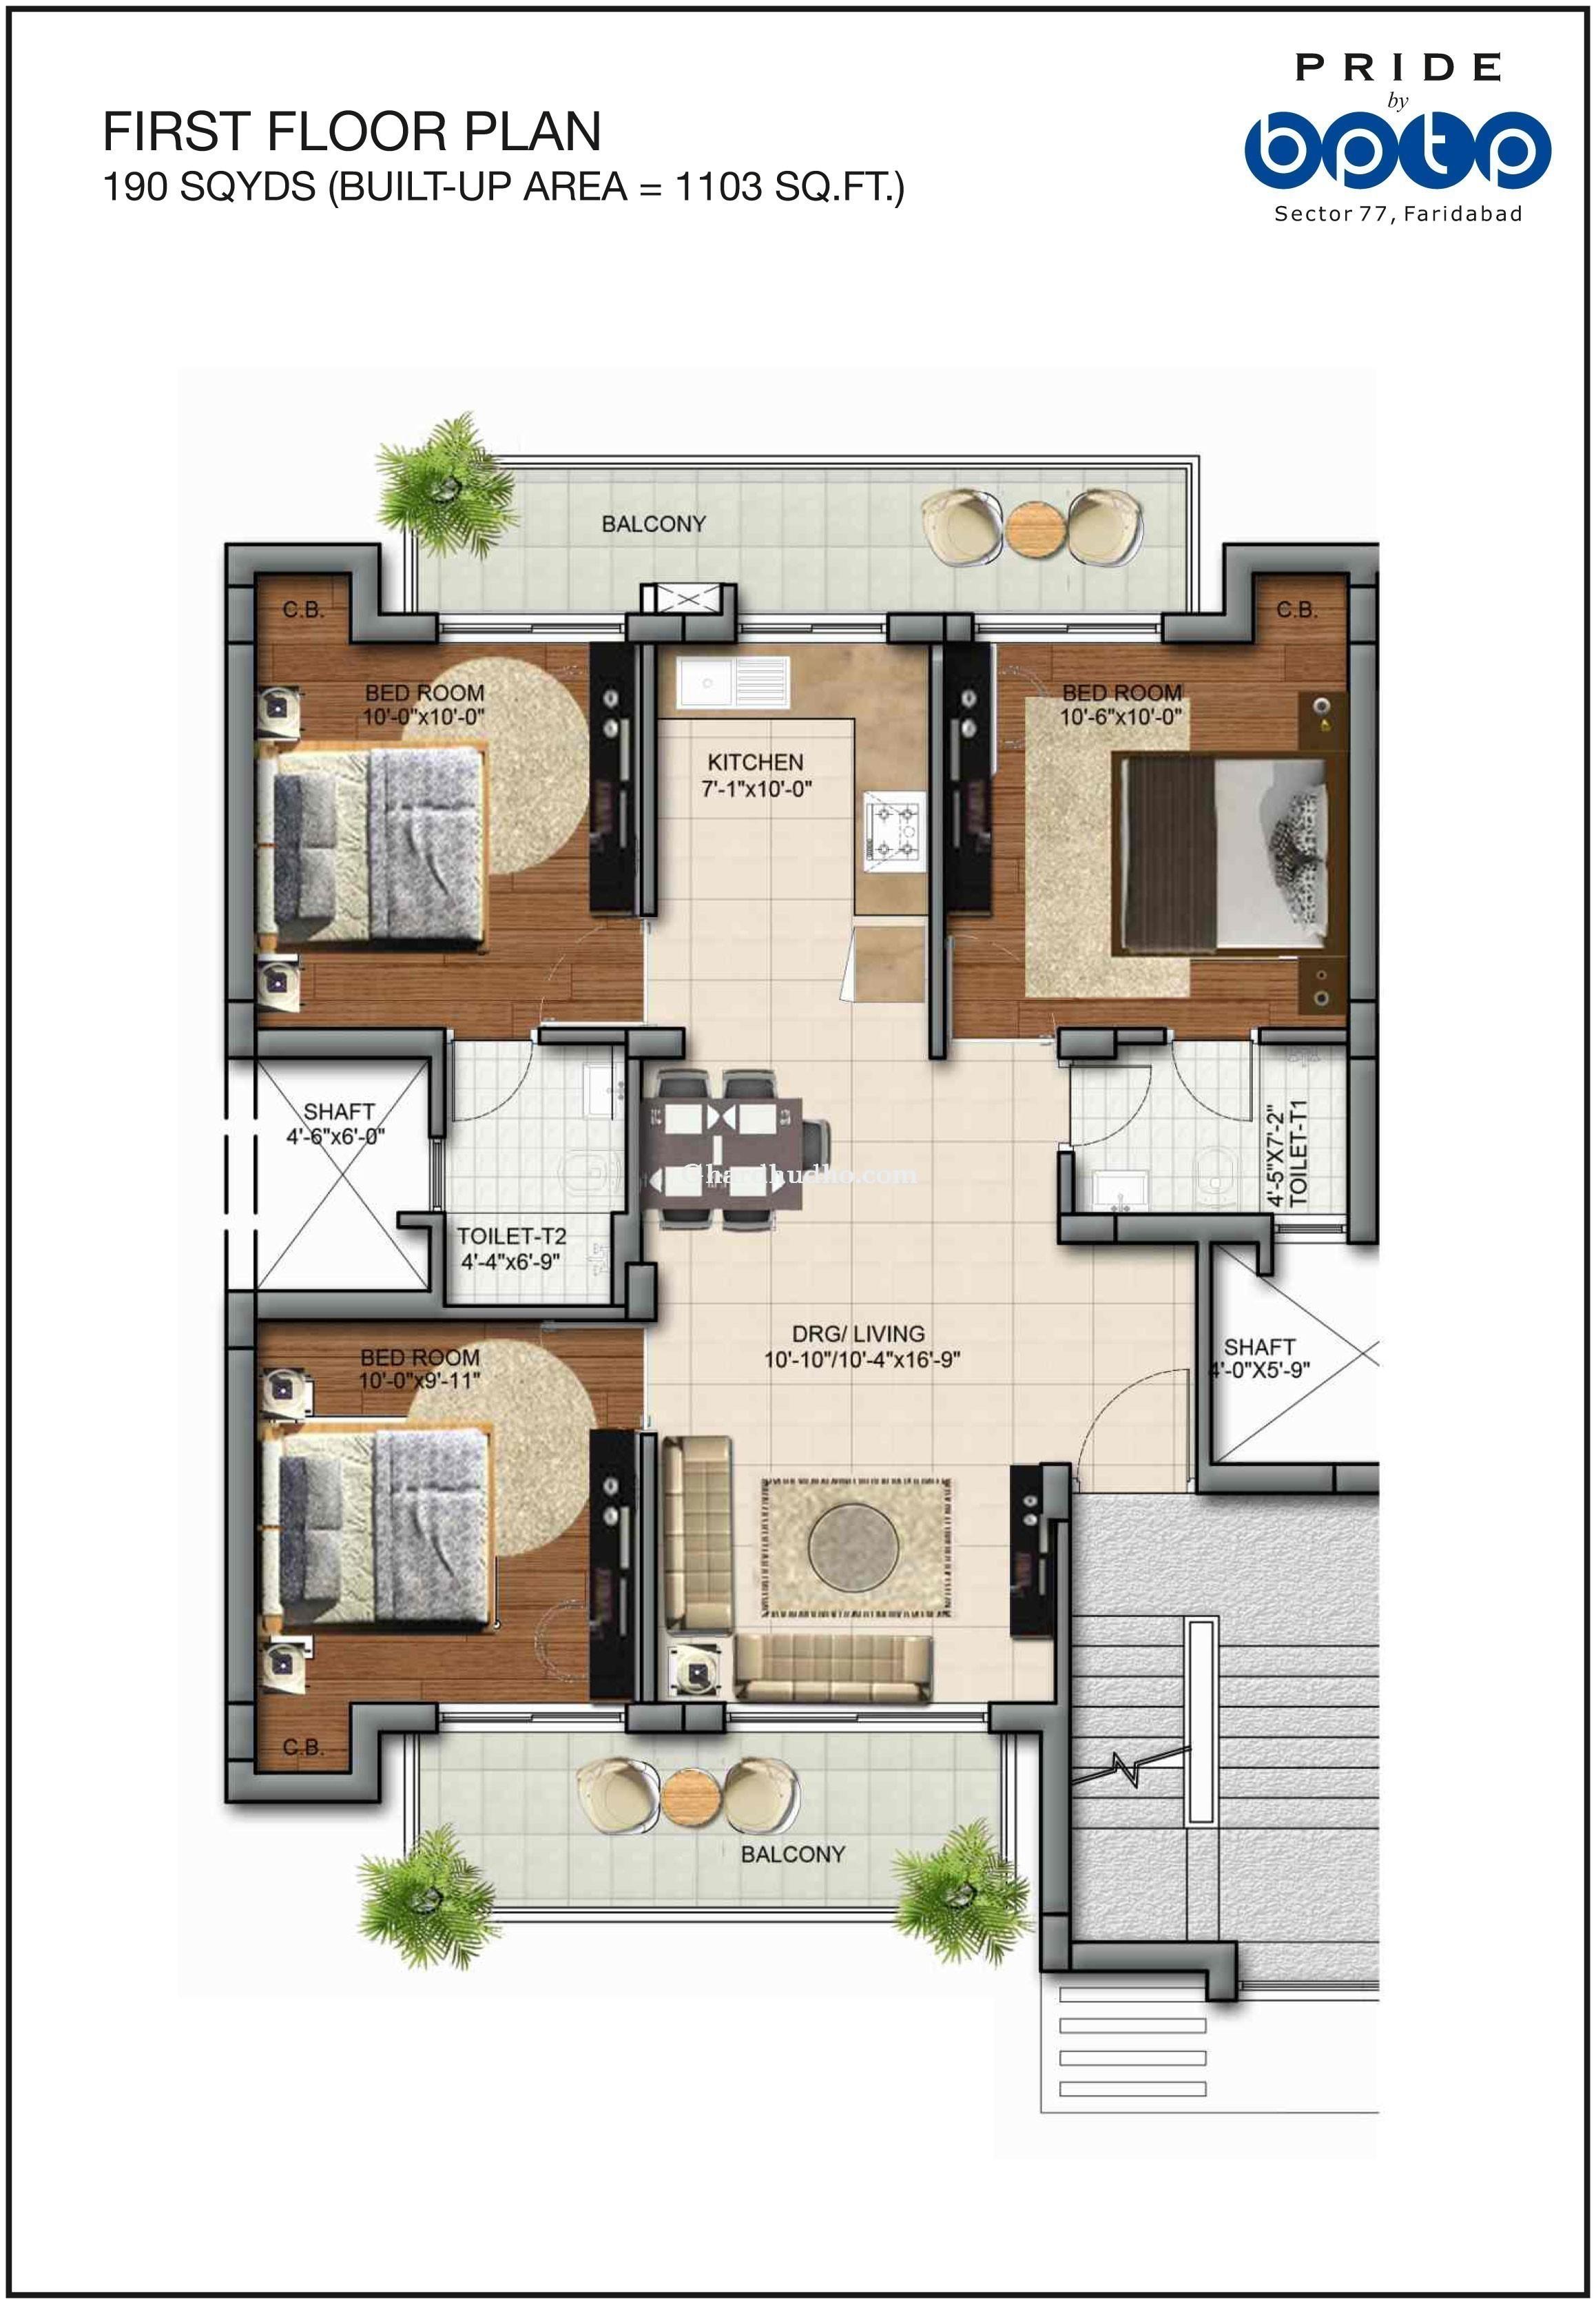 floor_plan_FIRST_FLOOR_PLAN_190_SQYDS_BUILT-UP_AREA__1103_SQ_FT_4.jpg